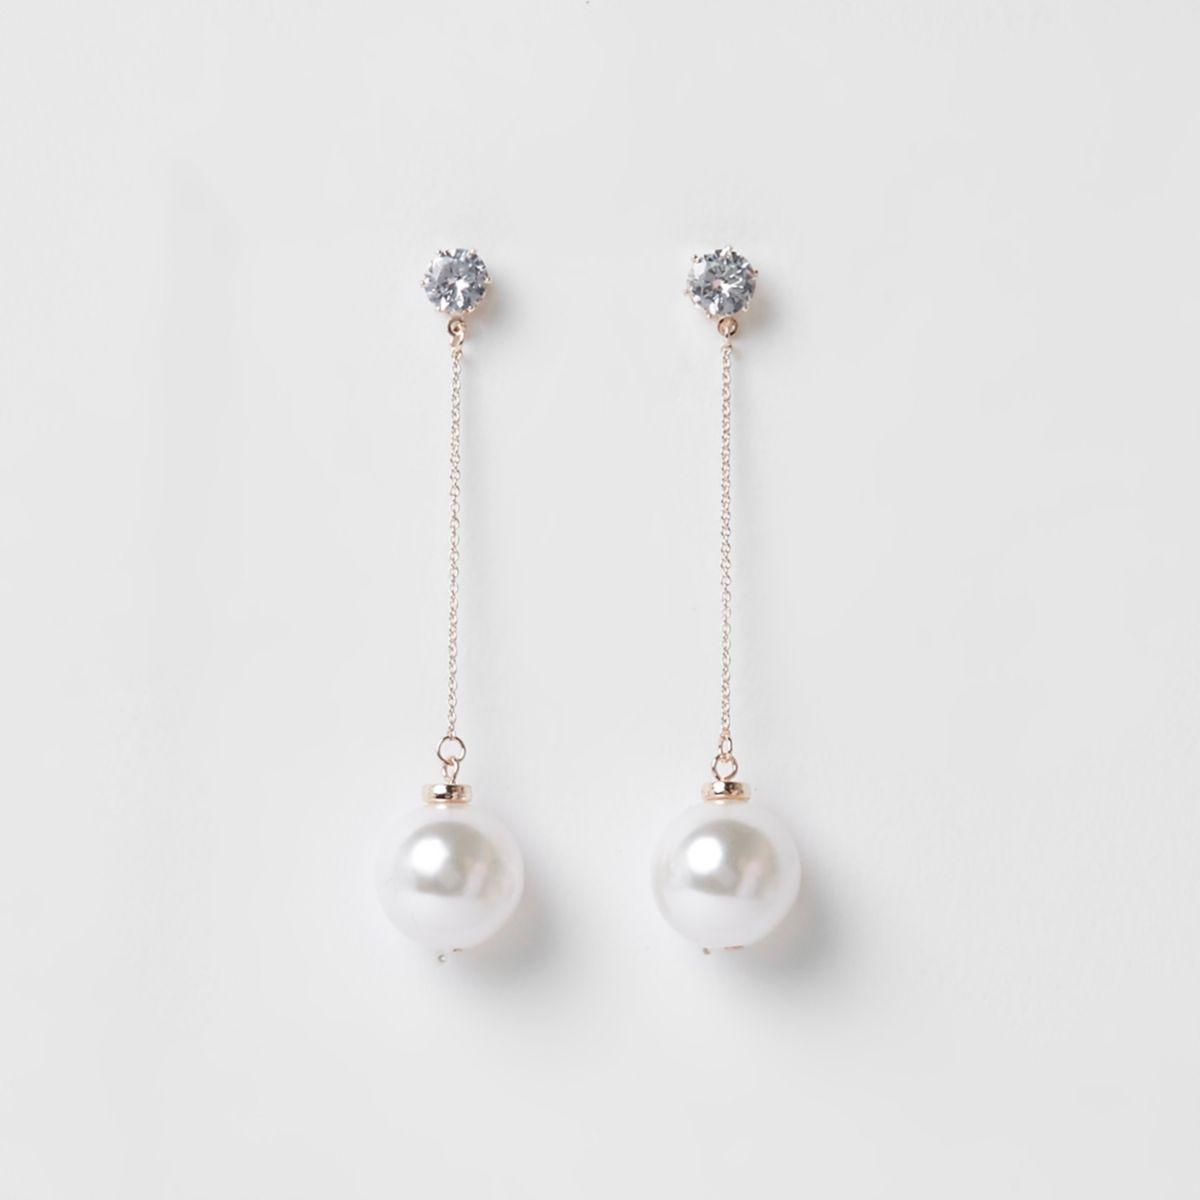 Rose gold tone pearl rhinestone drop earrings